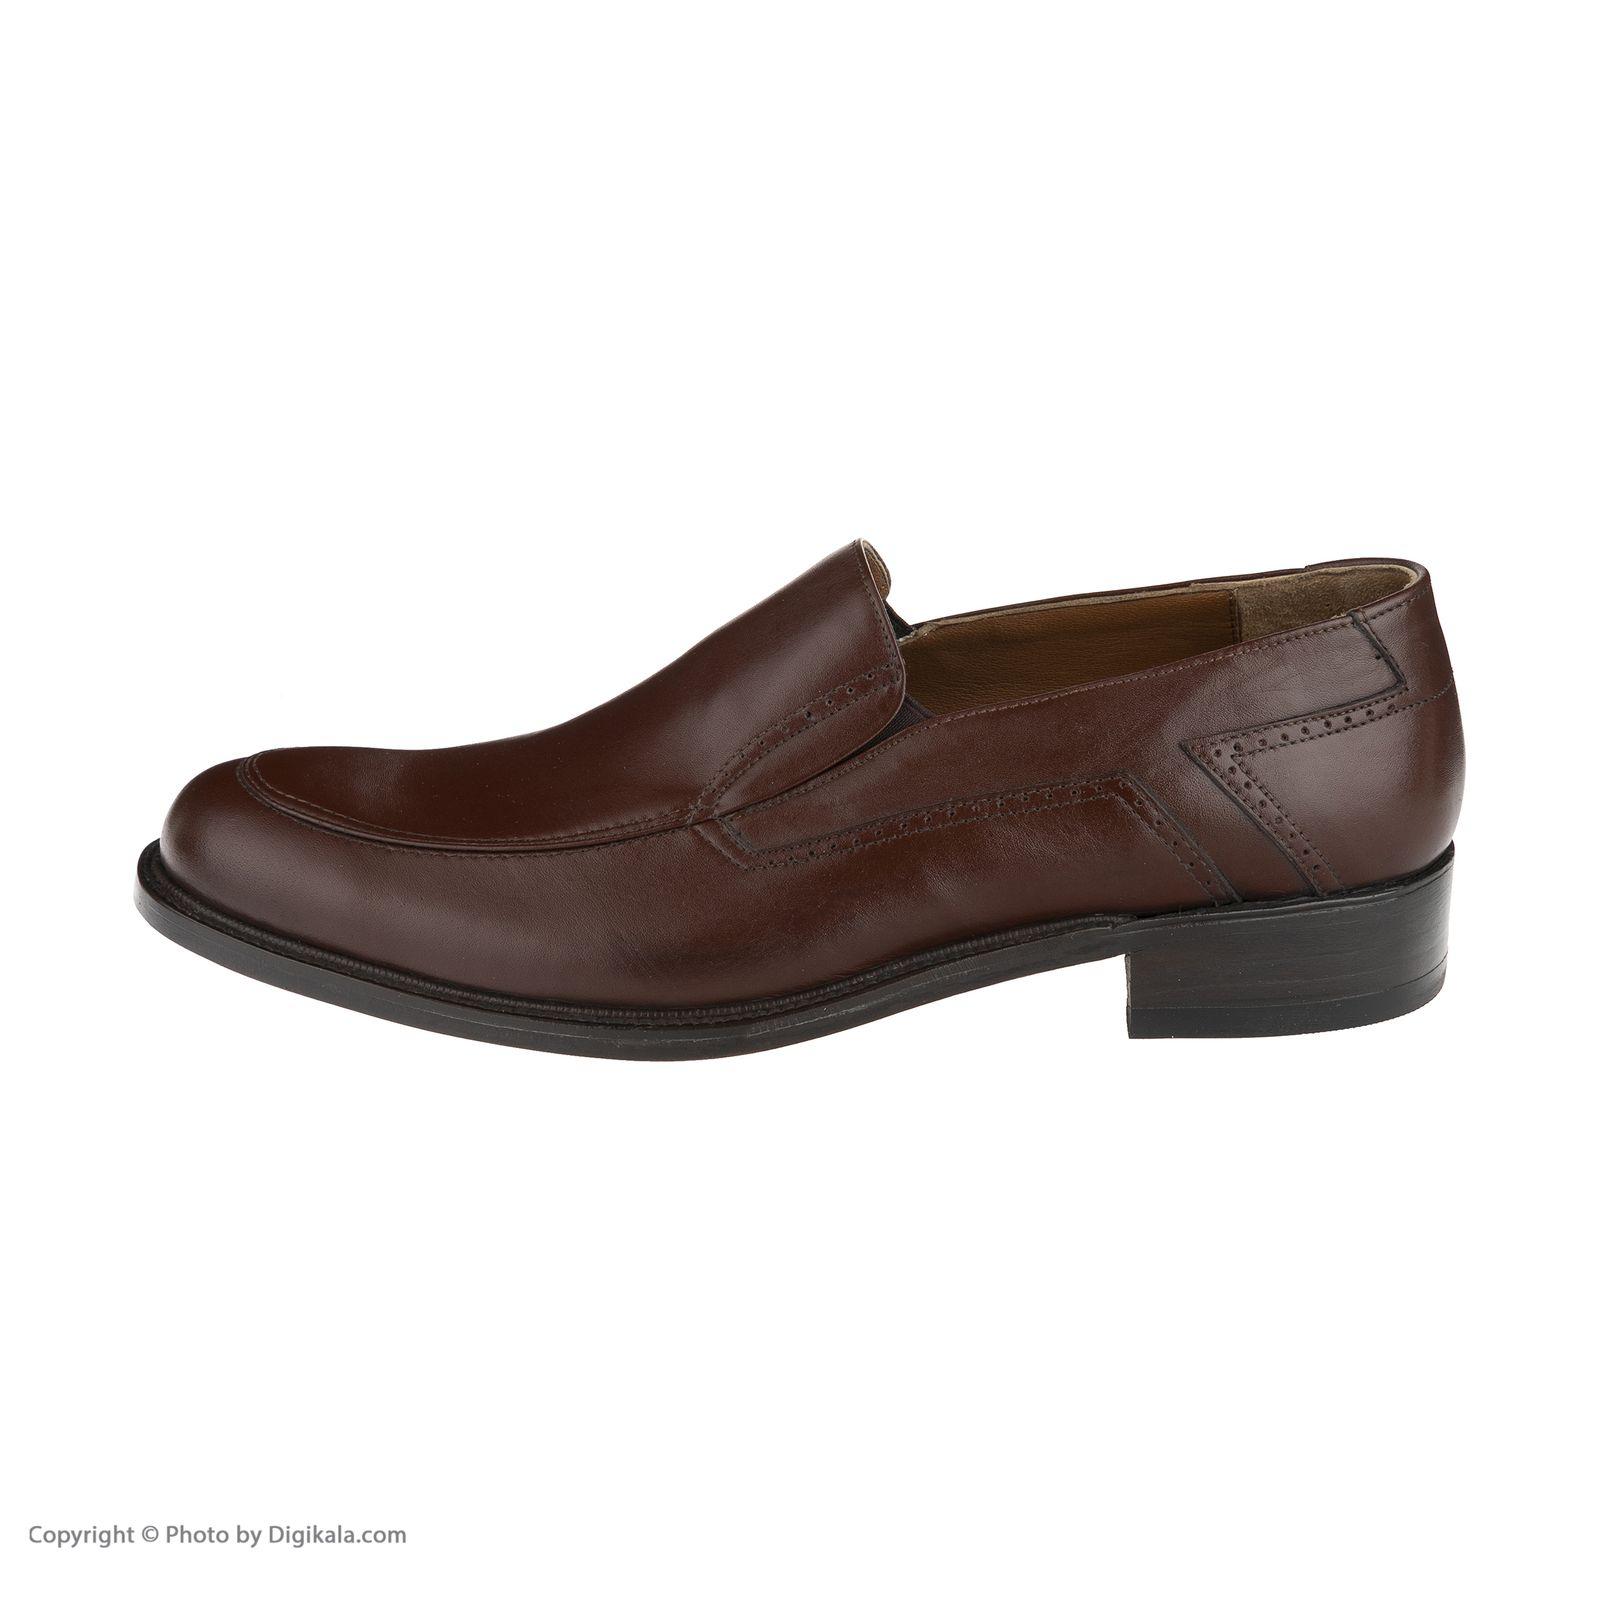 کفش مردانه نظری کد 434 -  - 3